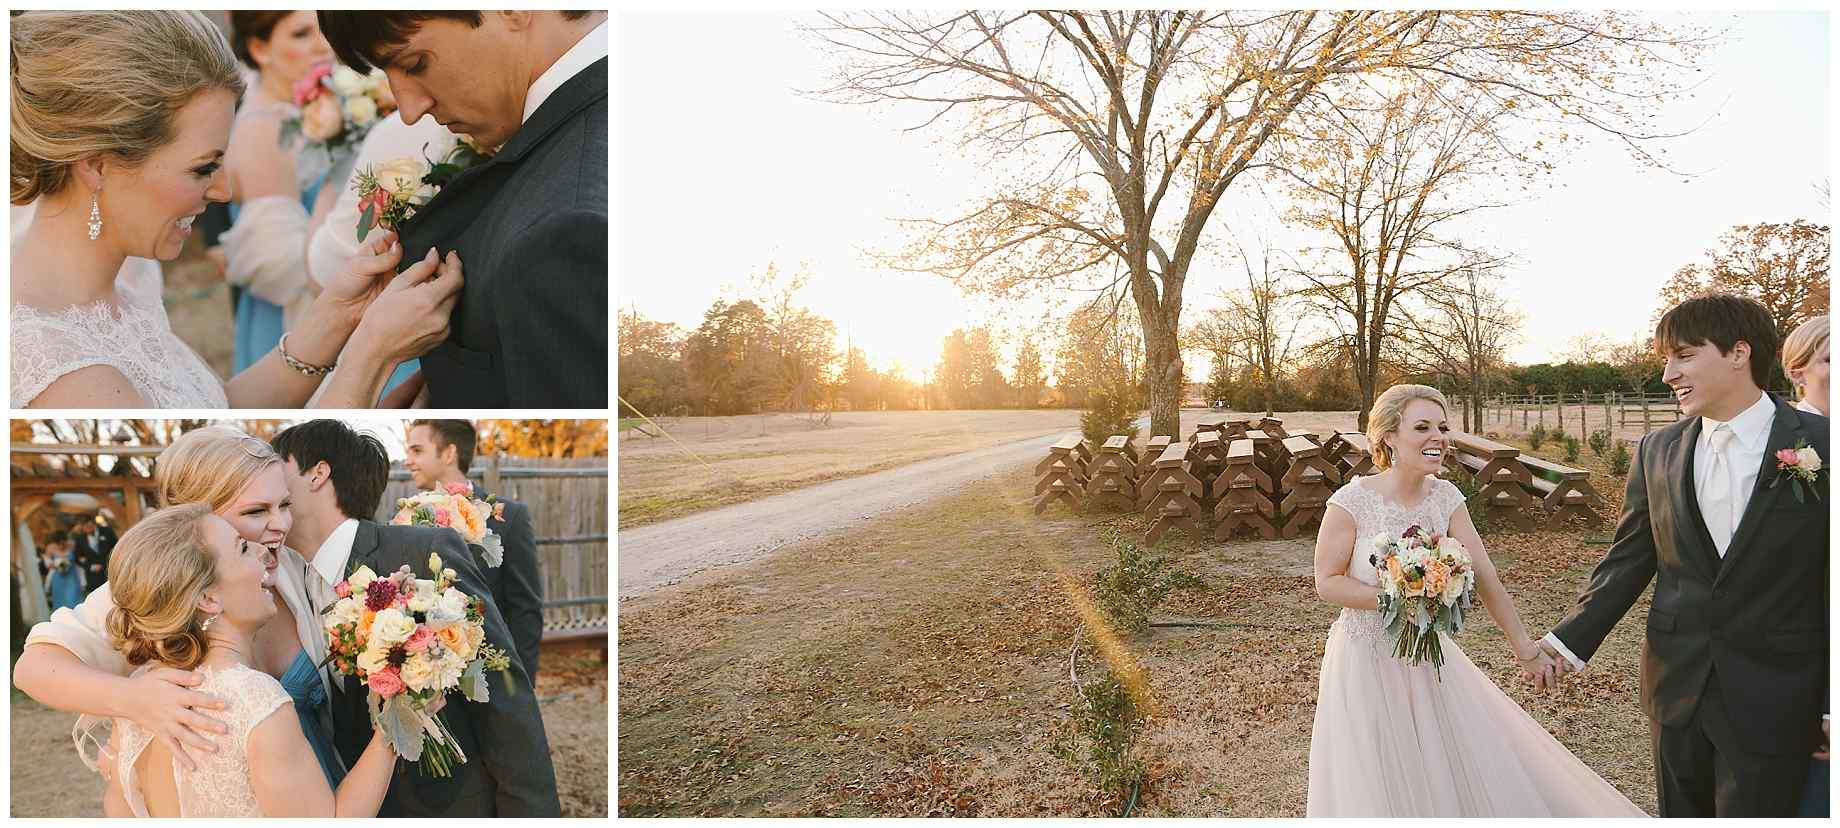 best-stone-oak-ranch-wedding-ever-00031